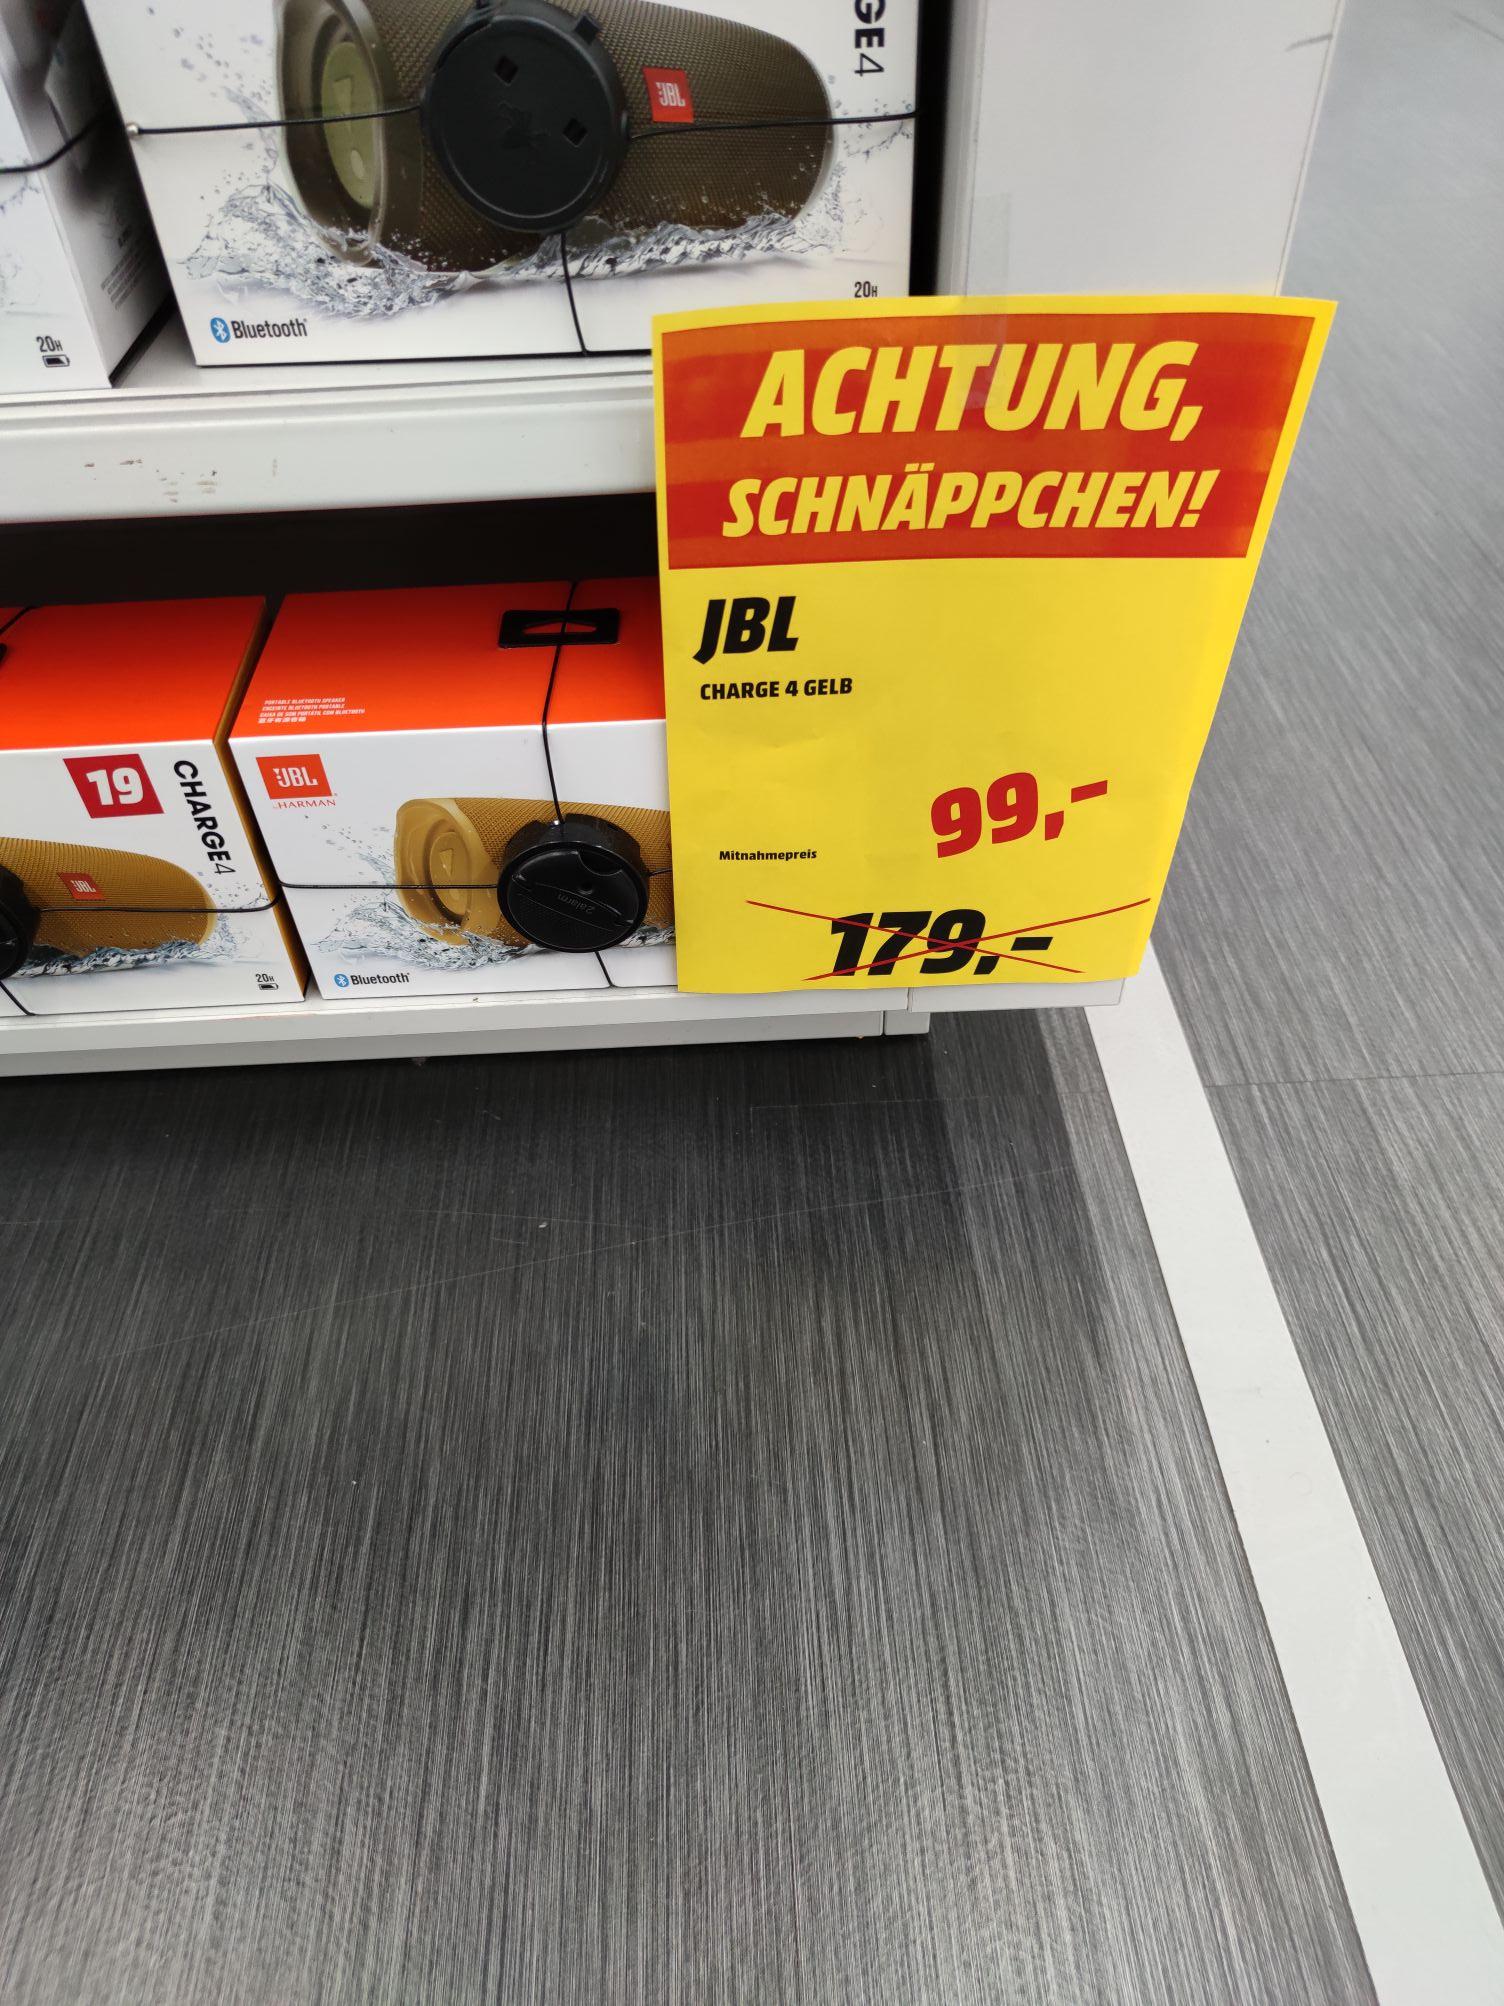 JBL Charge 4 Gelb (Lokal Mediamarkt Schweinfurt Stadtgalerie)